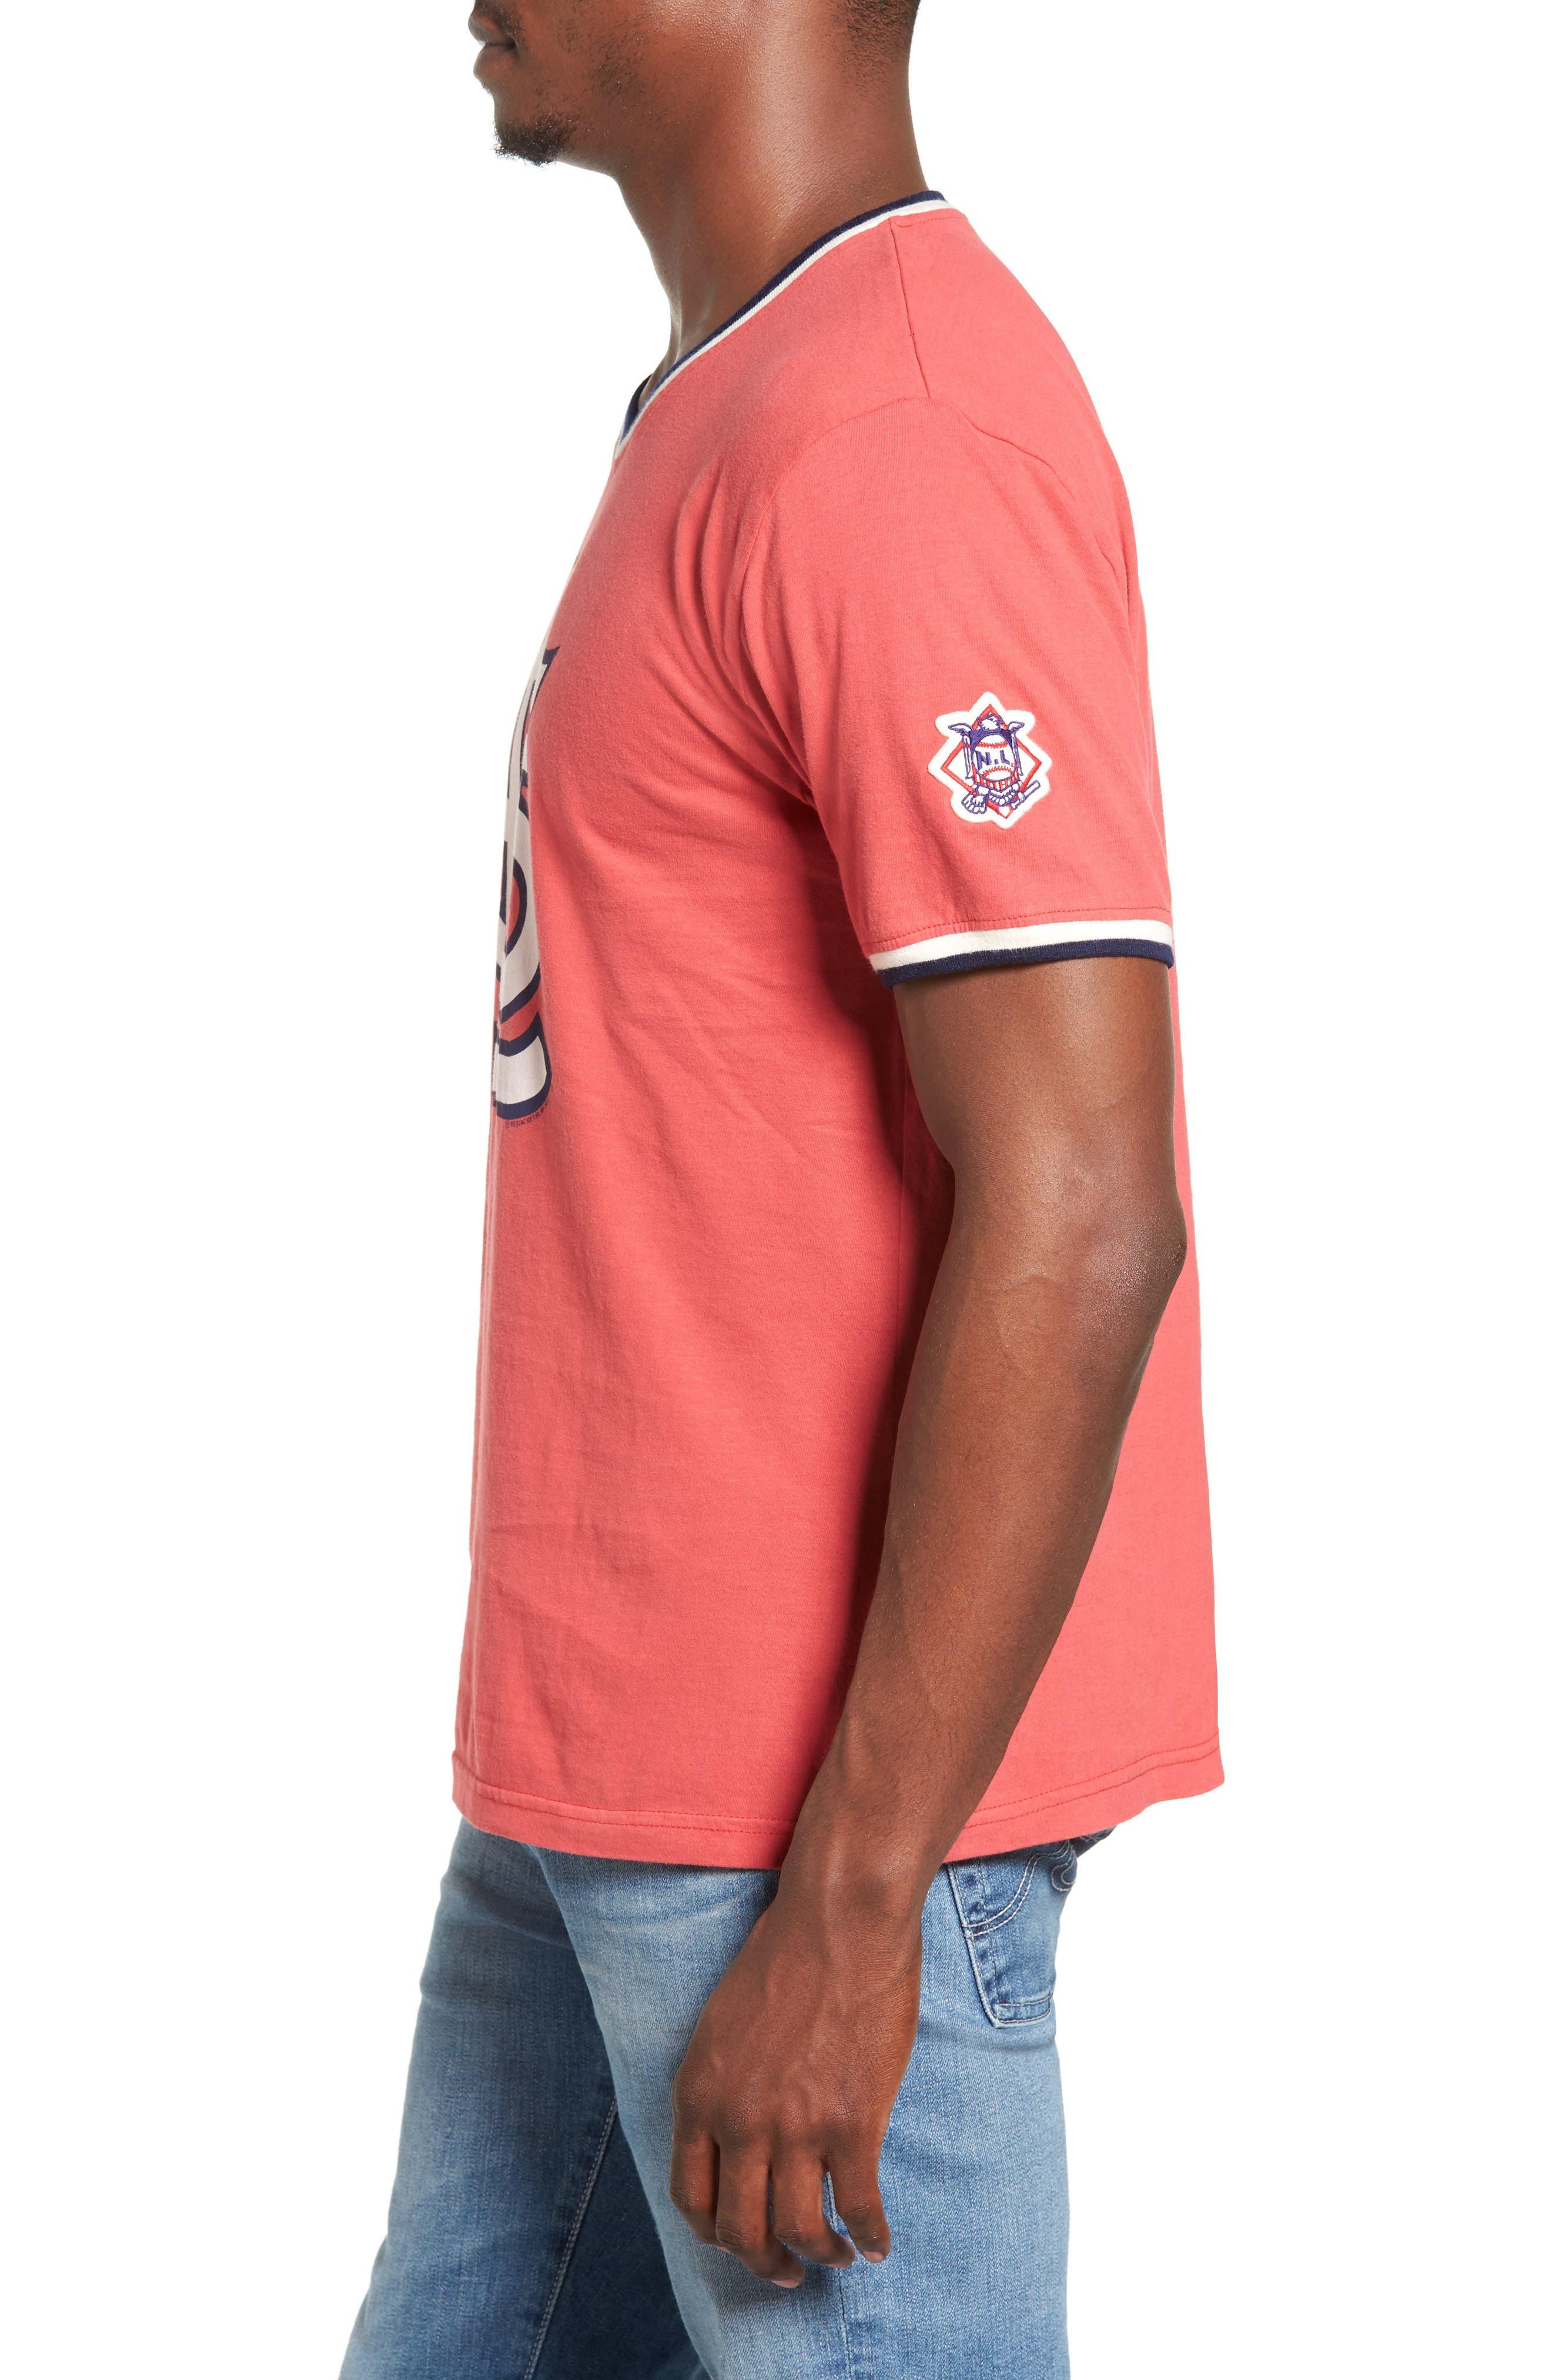 Eastwood St. Louis Cardinals T-Shirt,                             Alternate thumbnail 3, color,                             Red